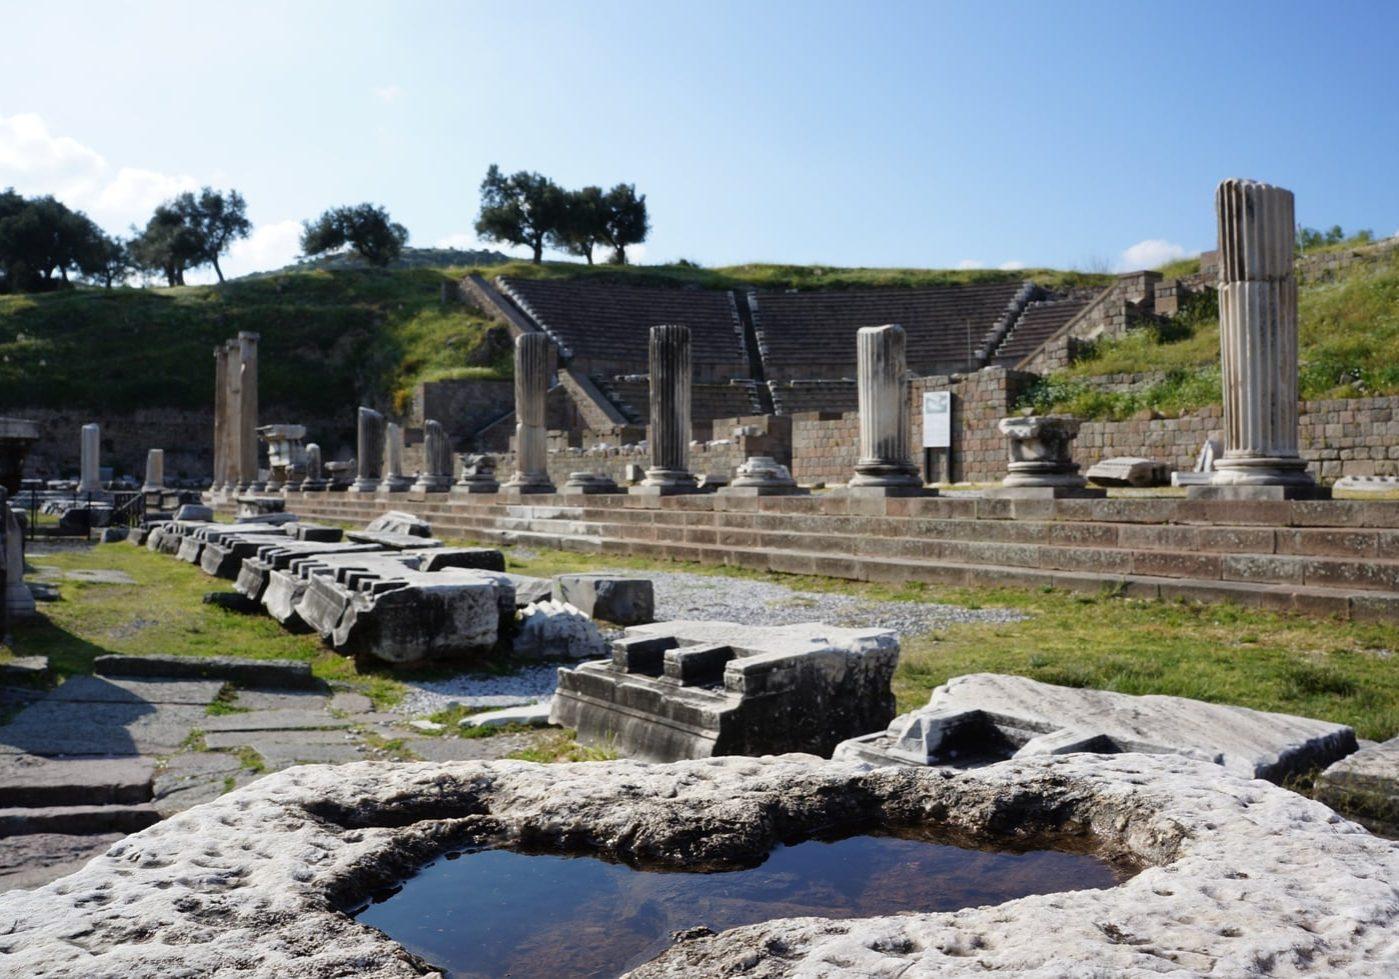 pohled-na-divadlo-Bergama-Turecko-UNESCO